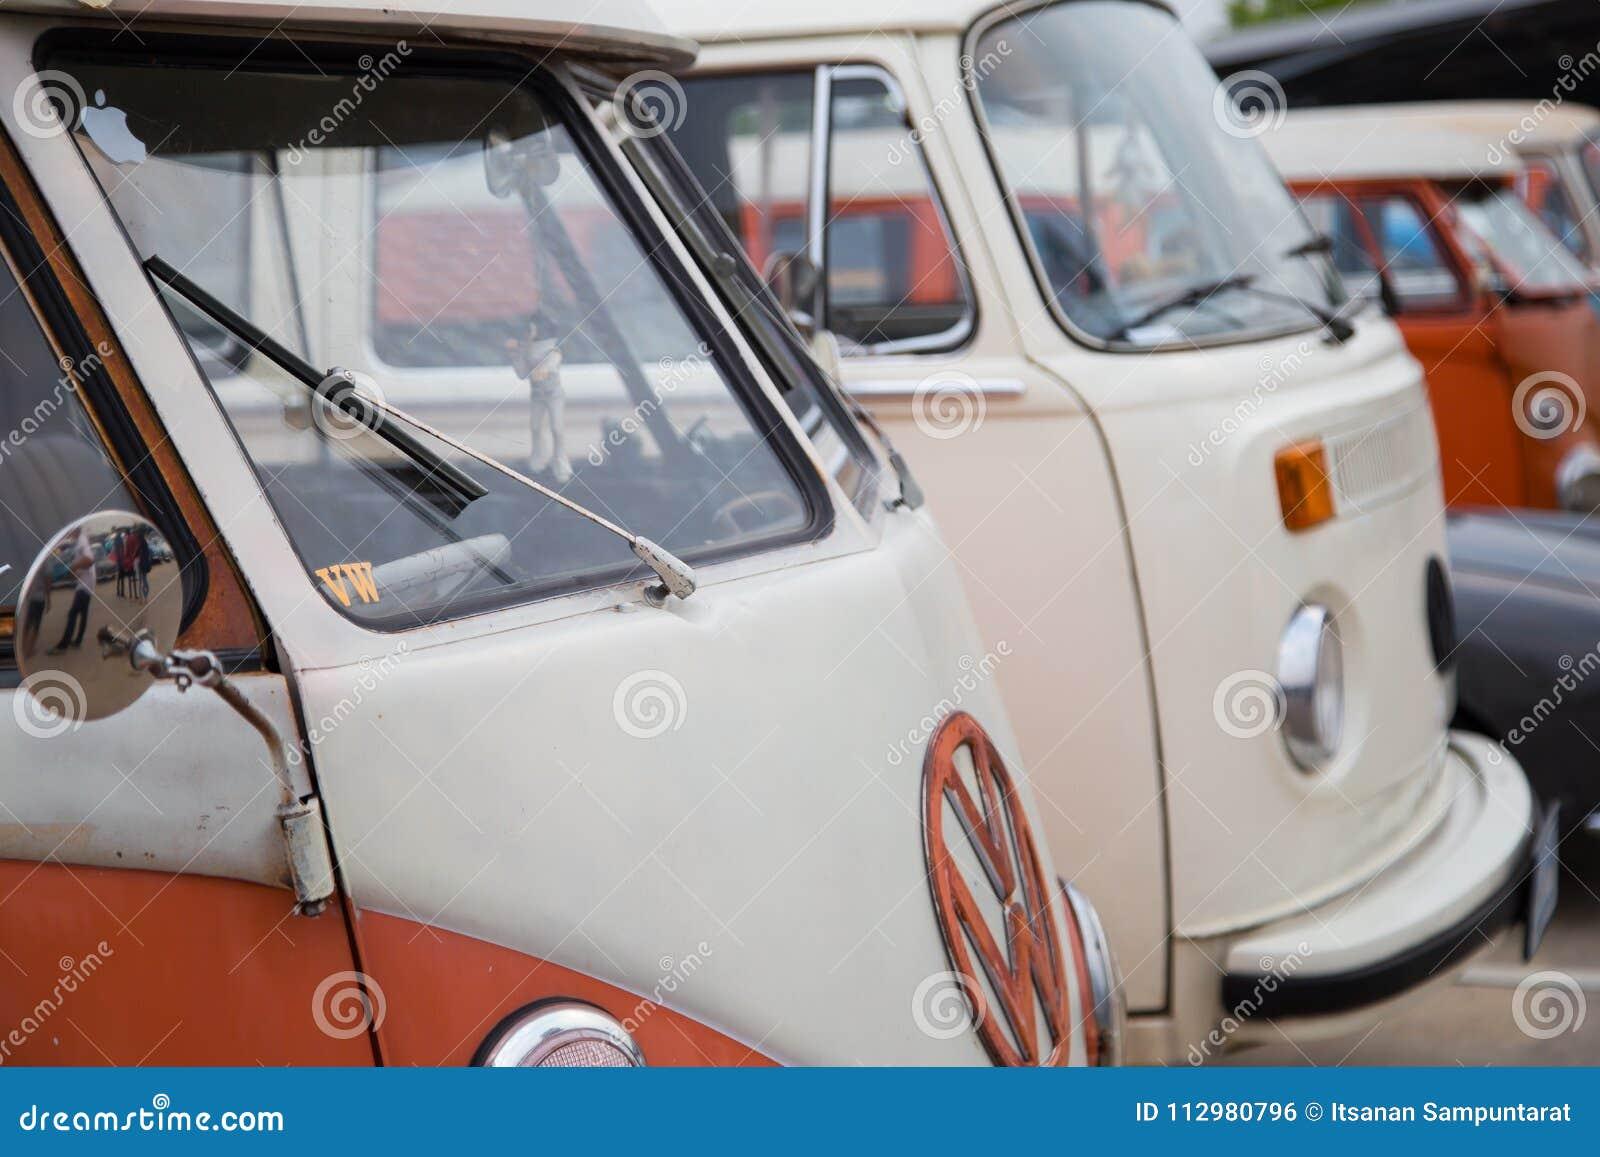 Volkswagen van owners club meeting in Thailand